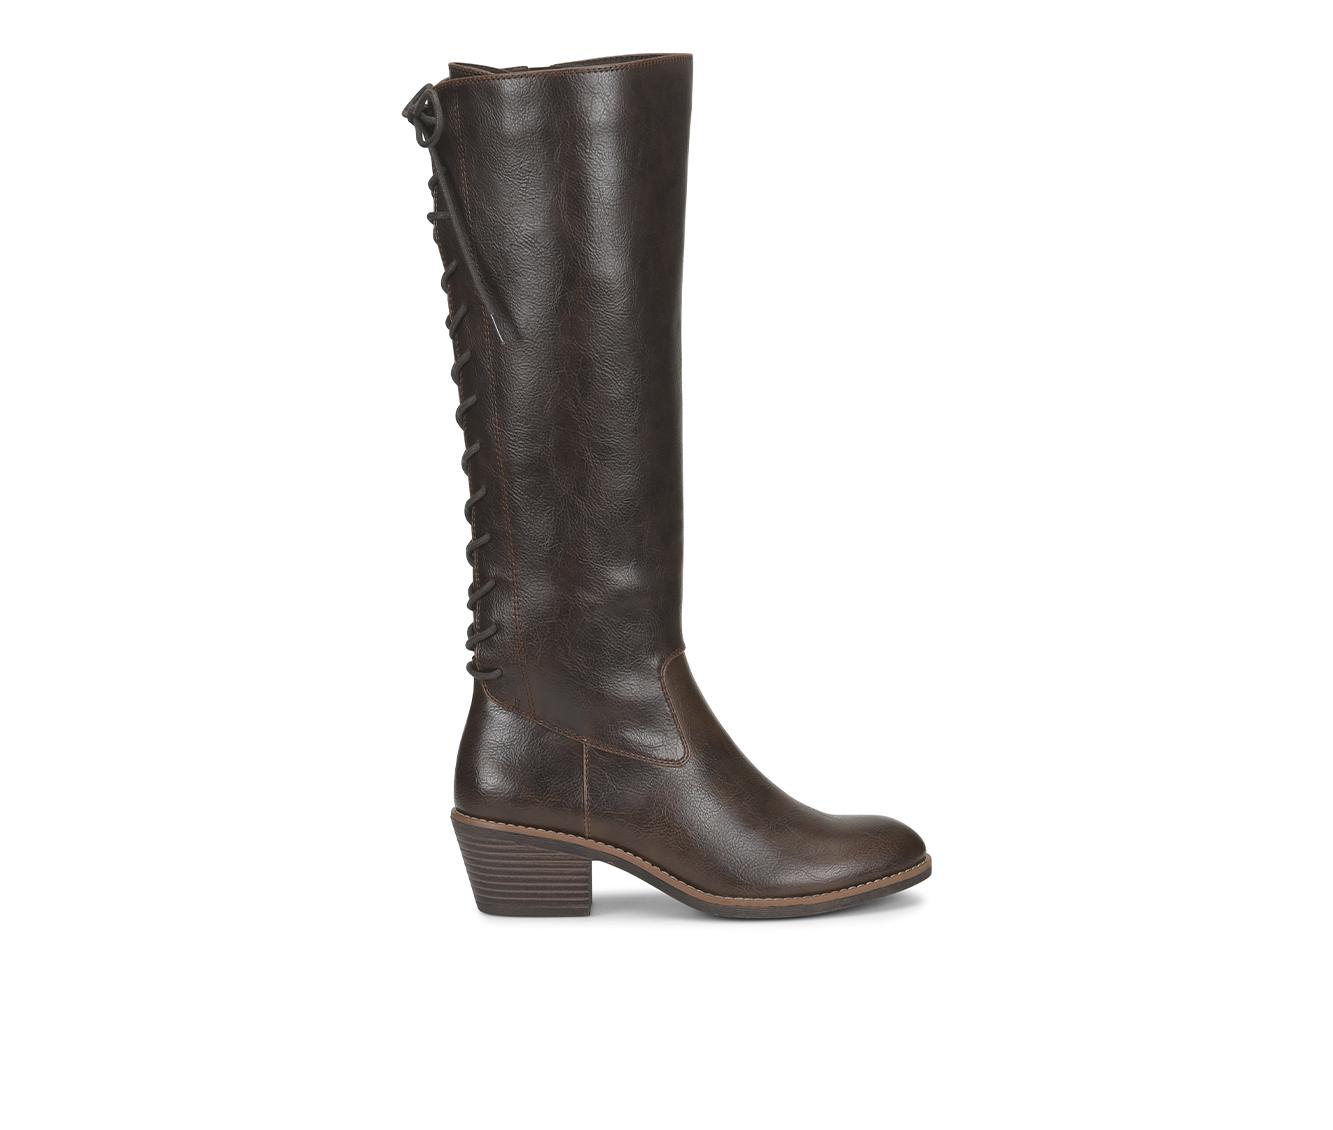 EuroSoft Carlen Women's Boot (Brown Faux Leather)